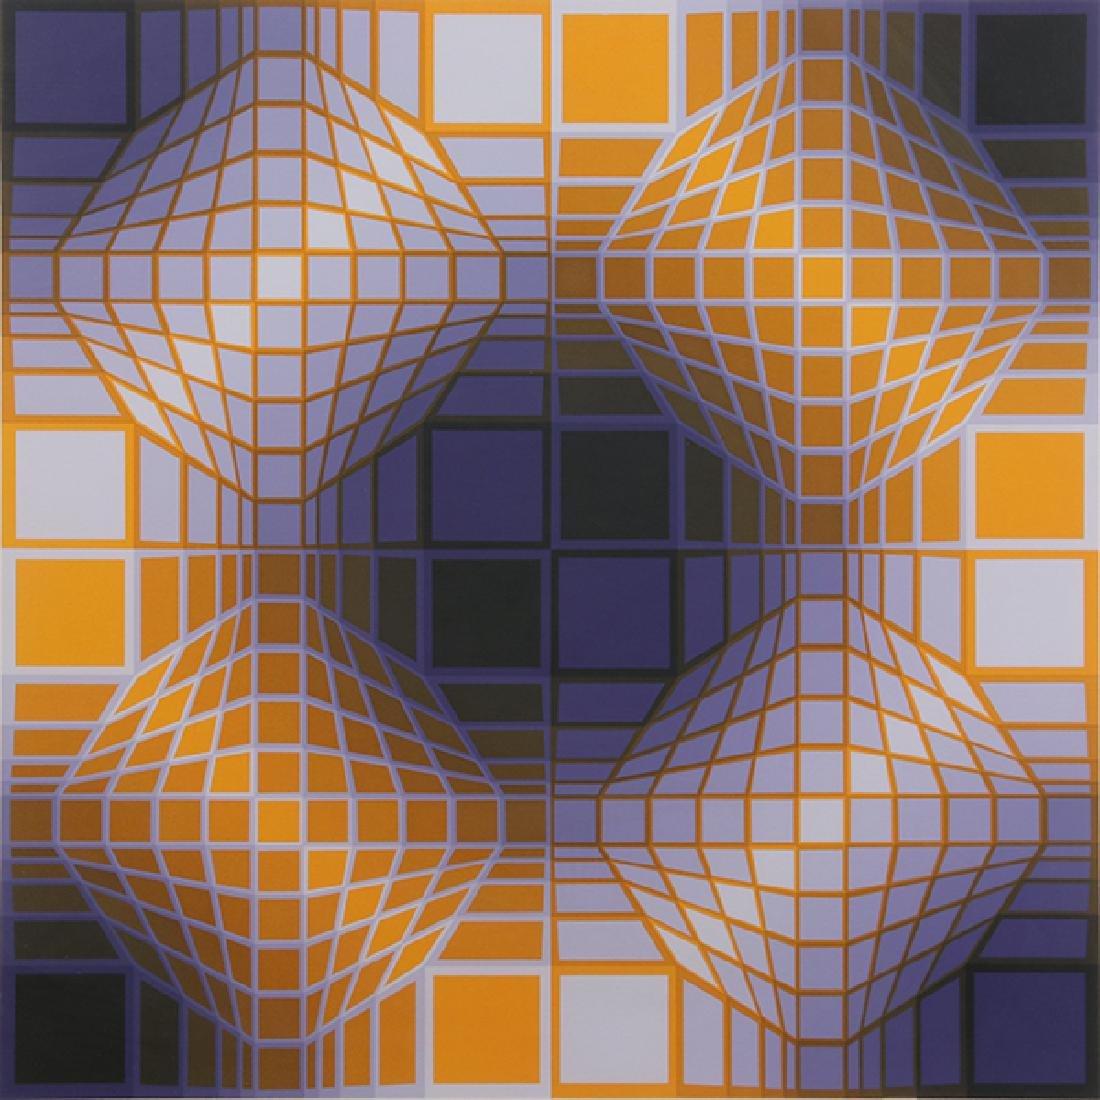 Prints, Victor Vasarely